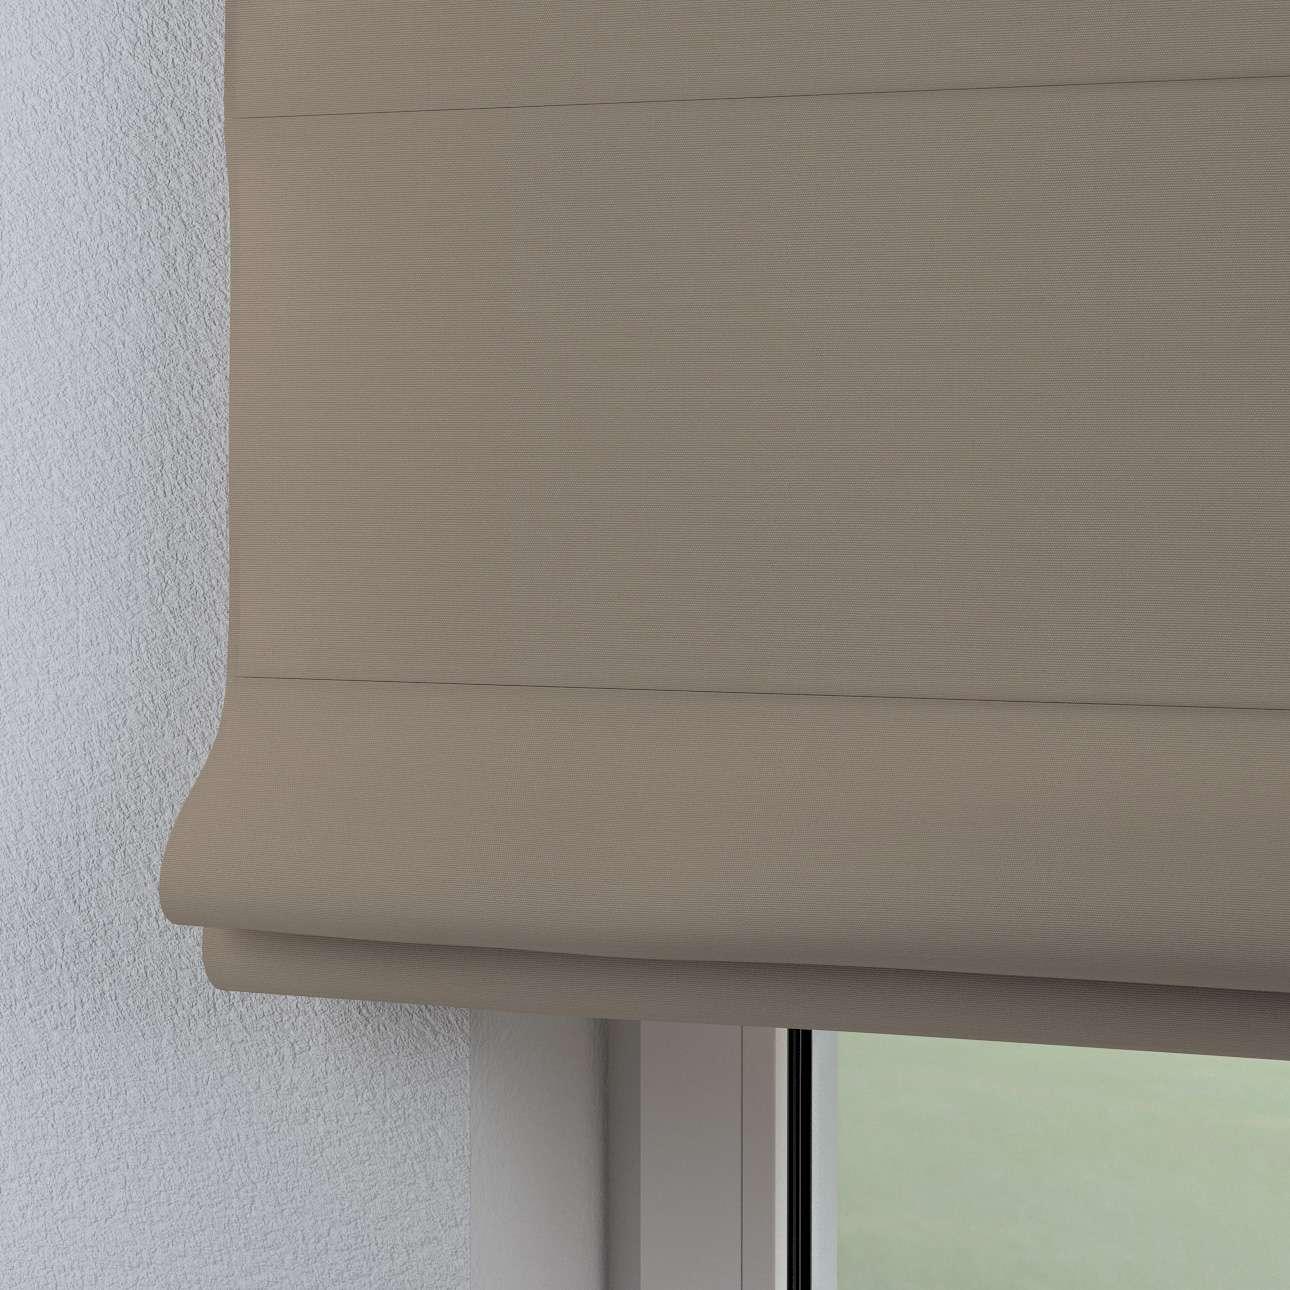 Raffrollo Capri 80 x 170 cm von der Kollektion Cotton Panama, Stoff: 702-28